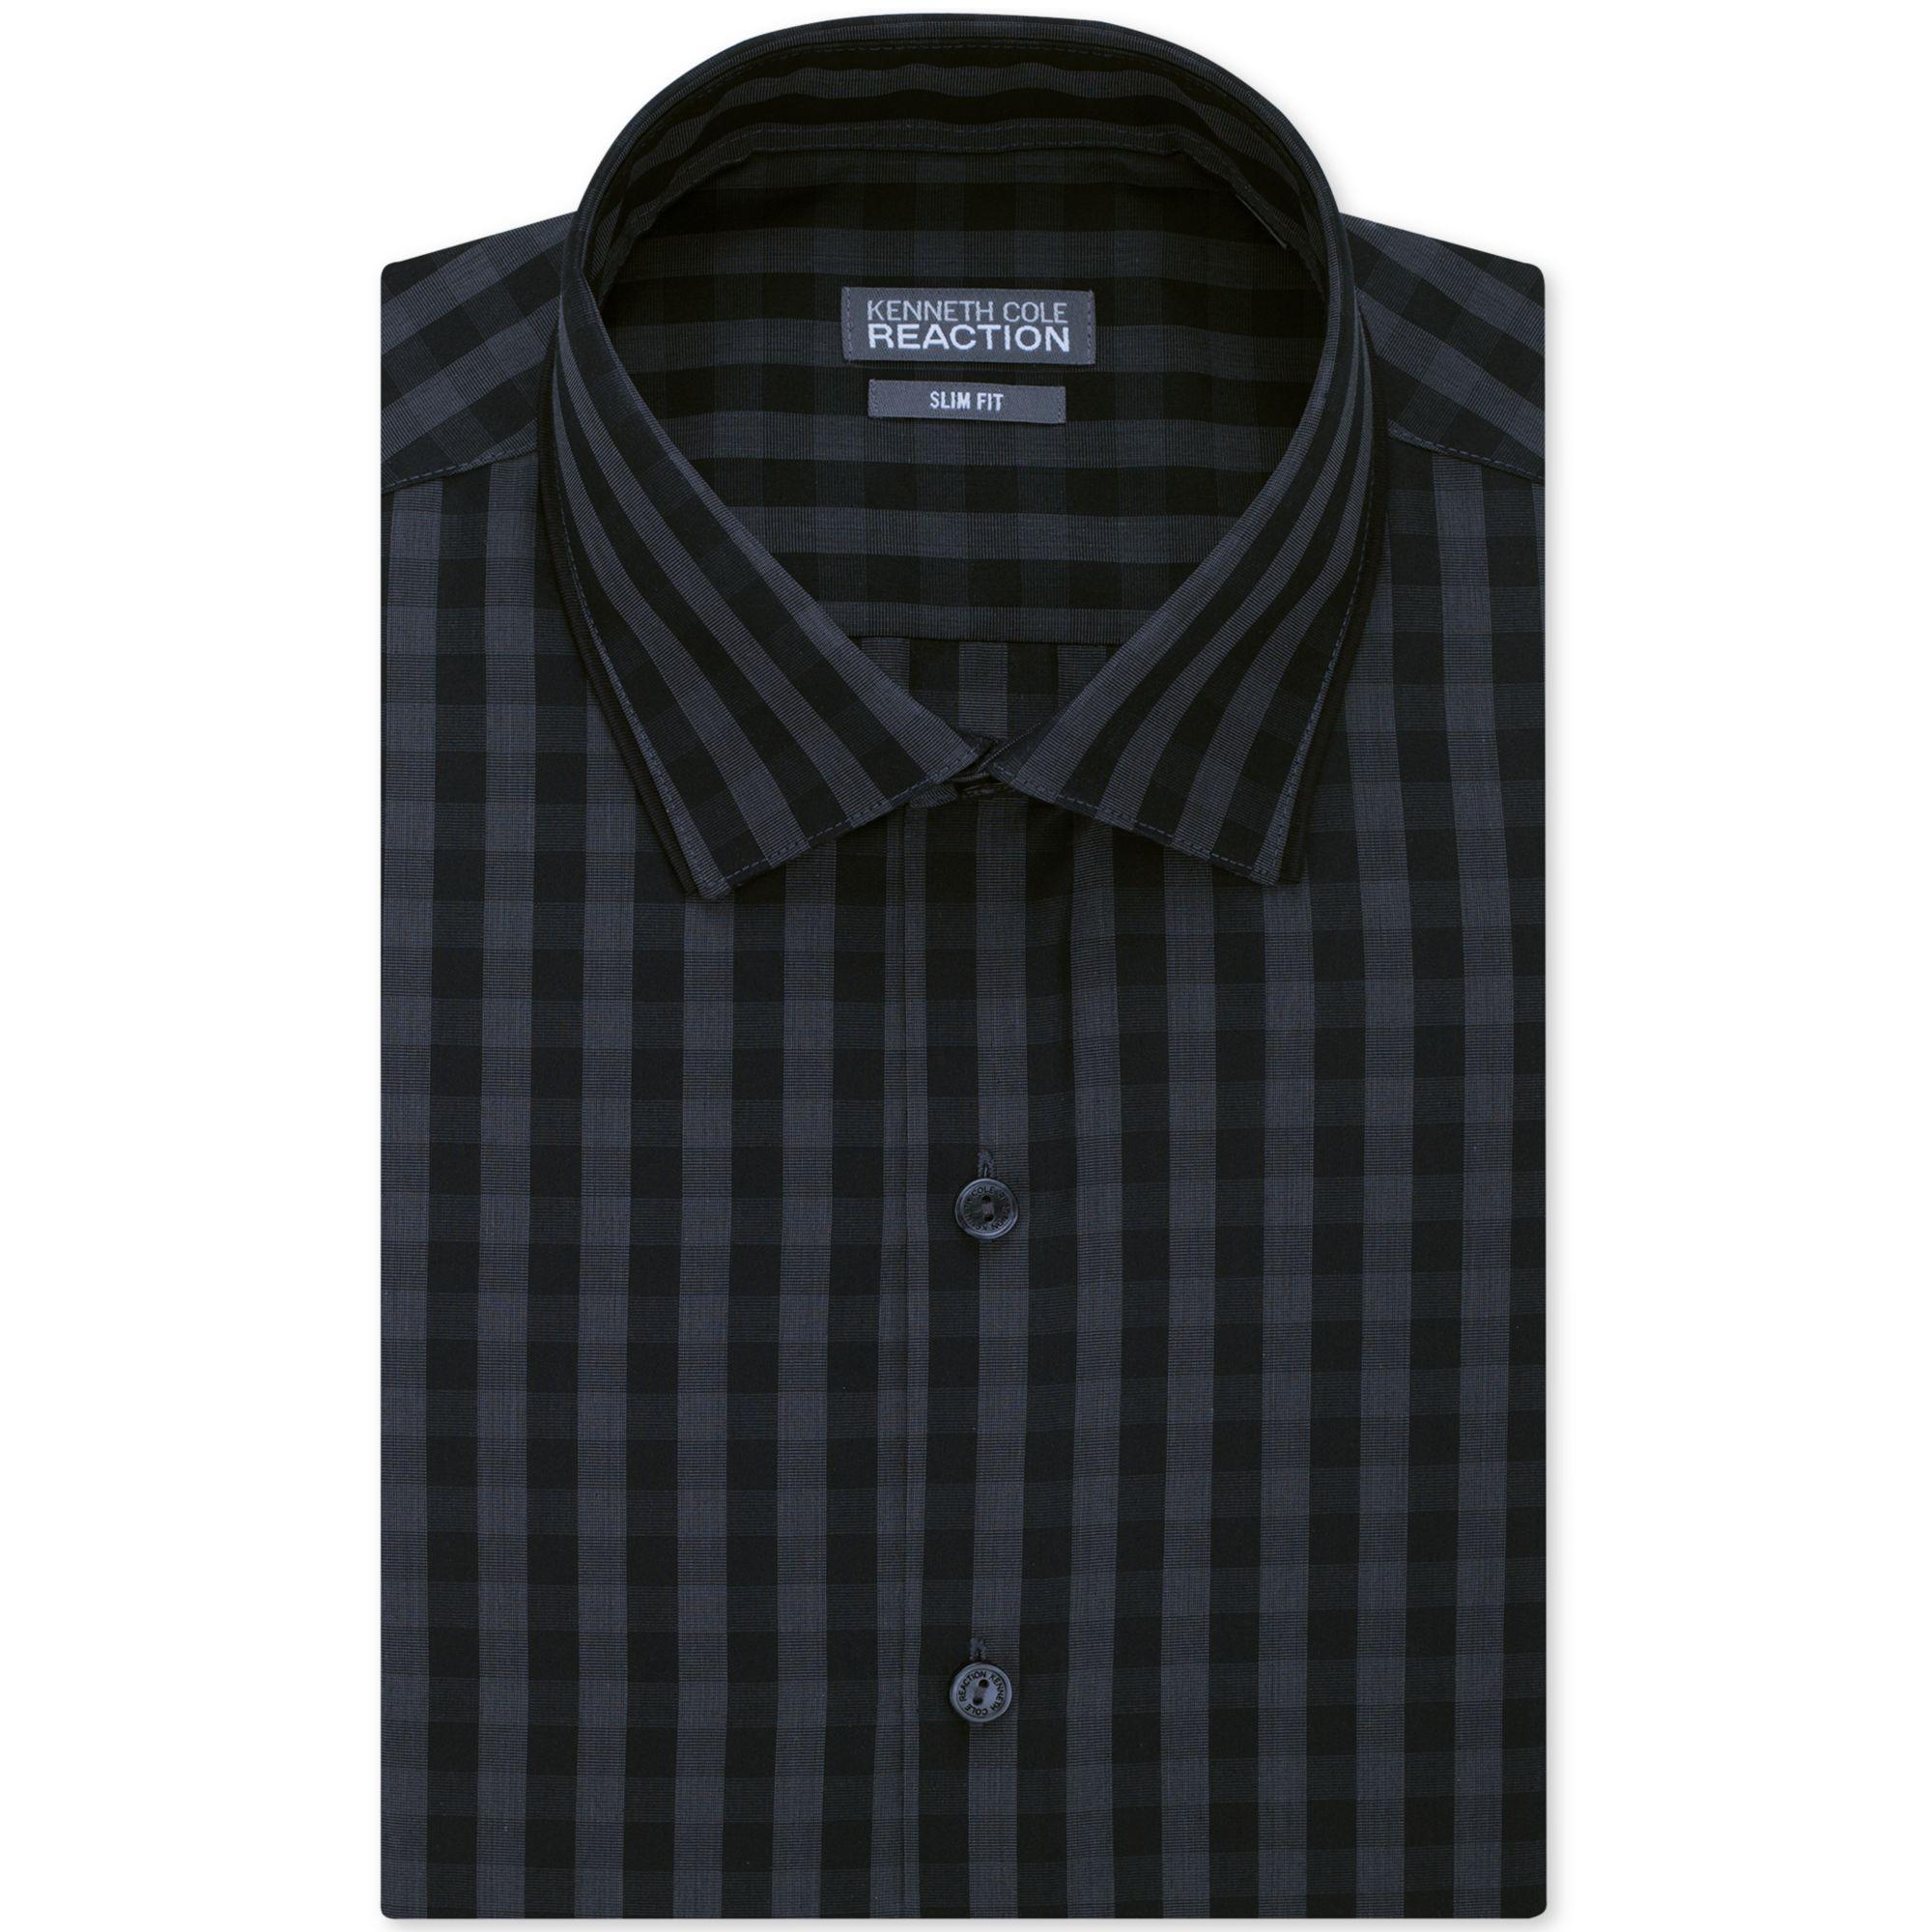 Kenneth cole reaction slim fit black tonal plaid dress for Mens black plaid dress shirt